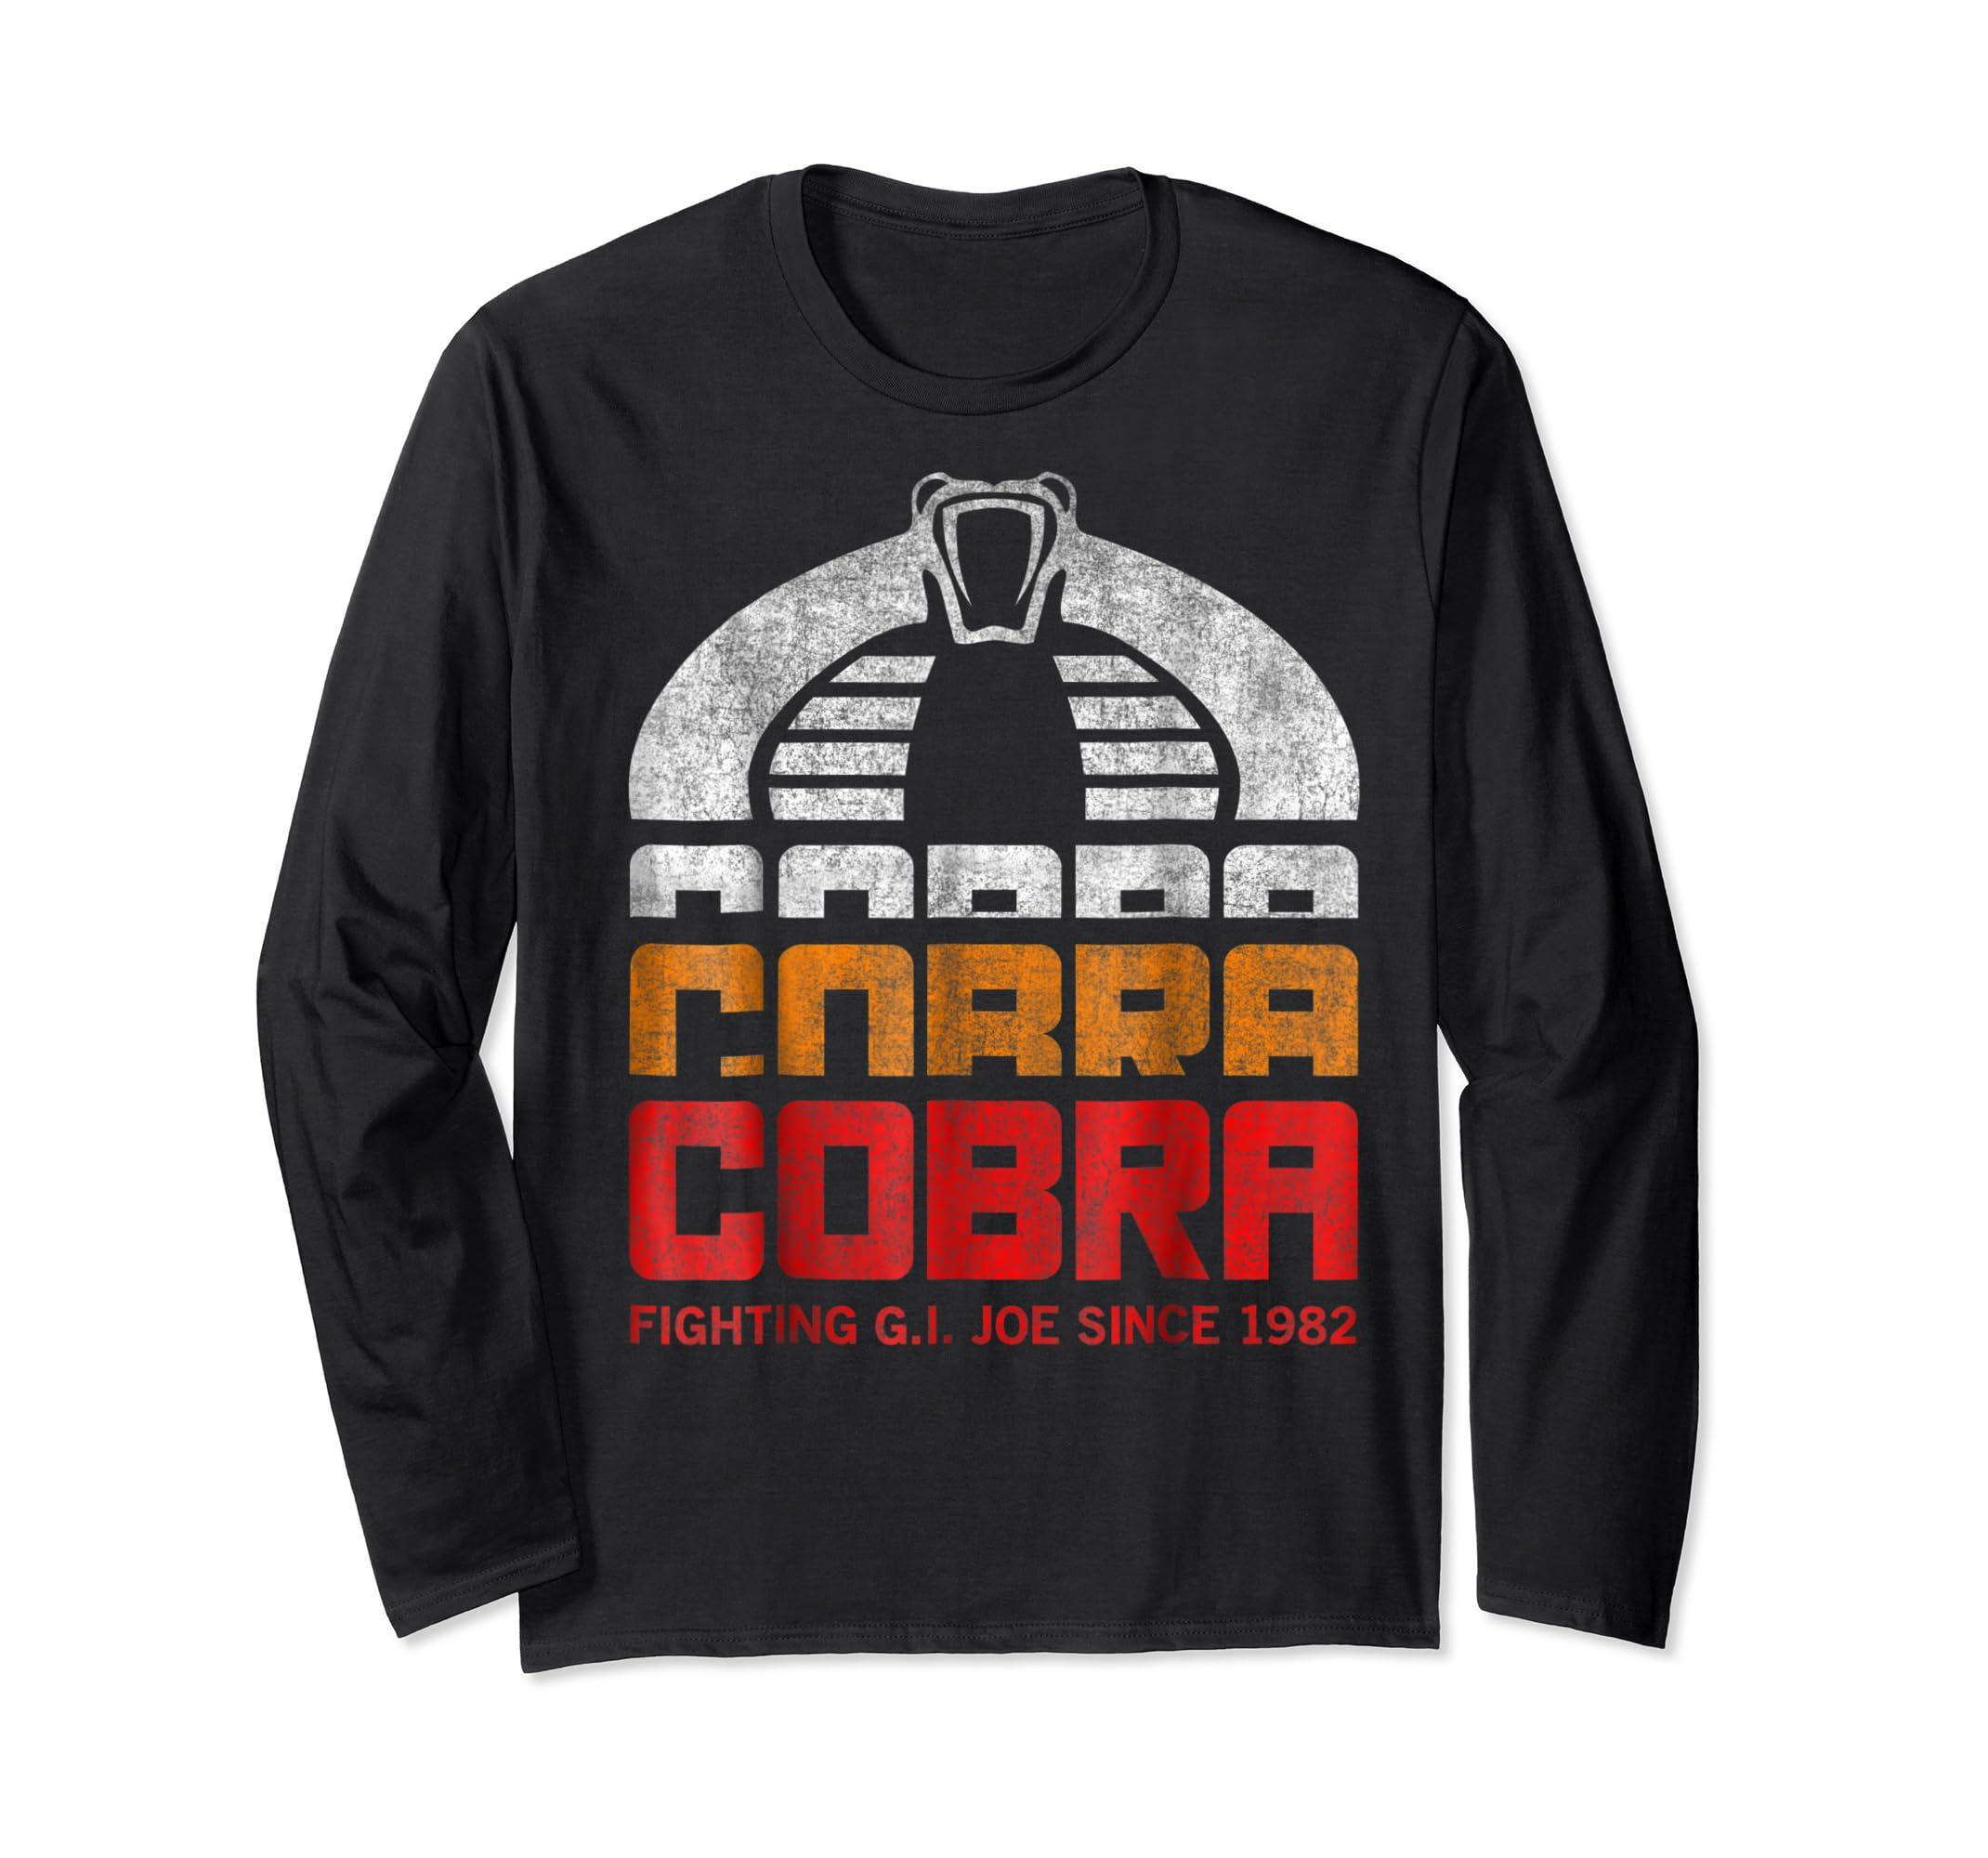 G.I. Joe Retro Cobra Fighting Since 1982 T-Shirt-Long Sleeve-Black